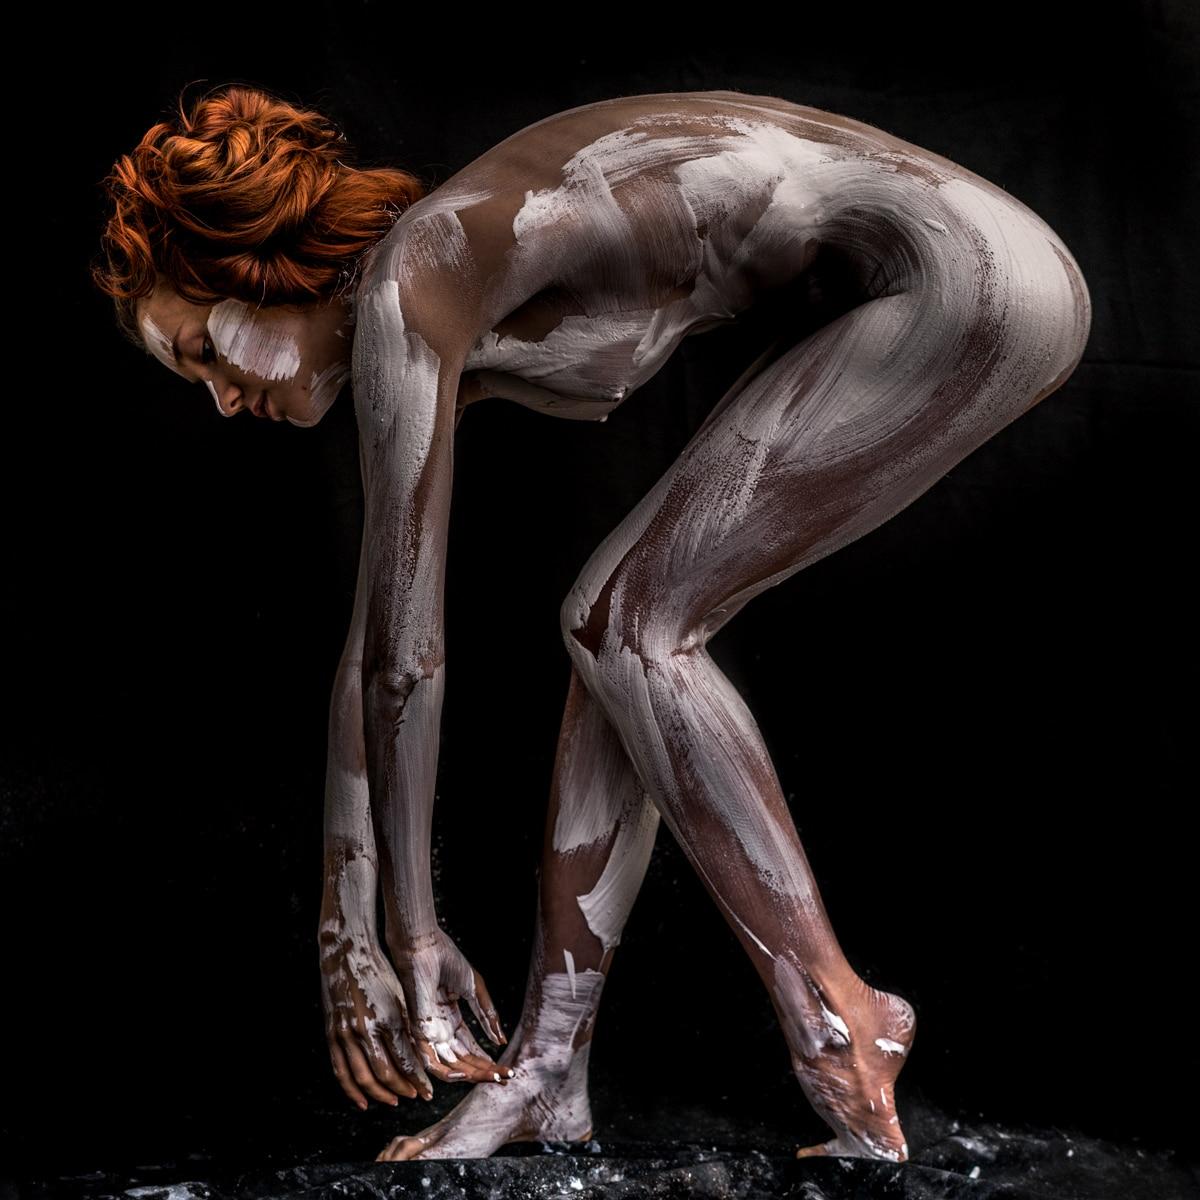 contemporary art photography